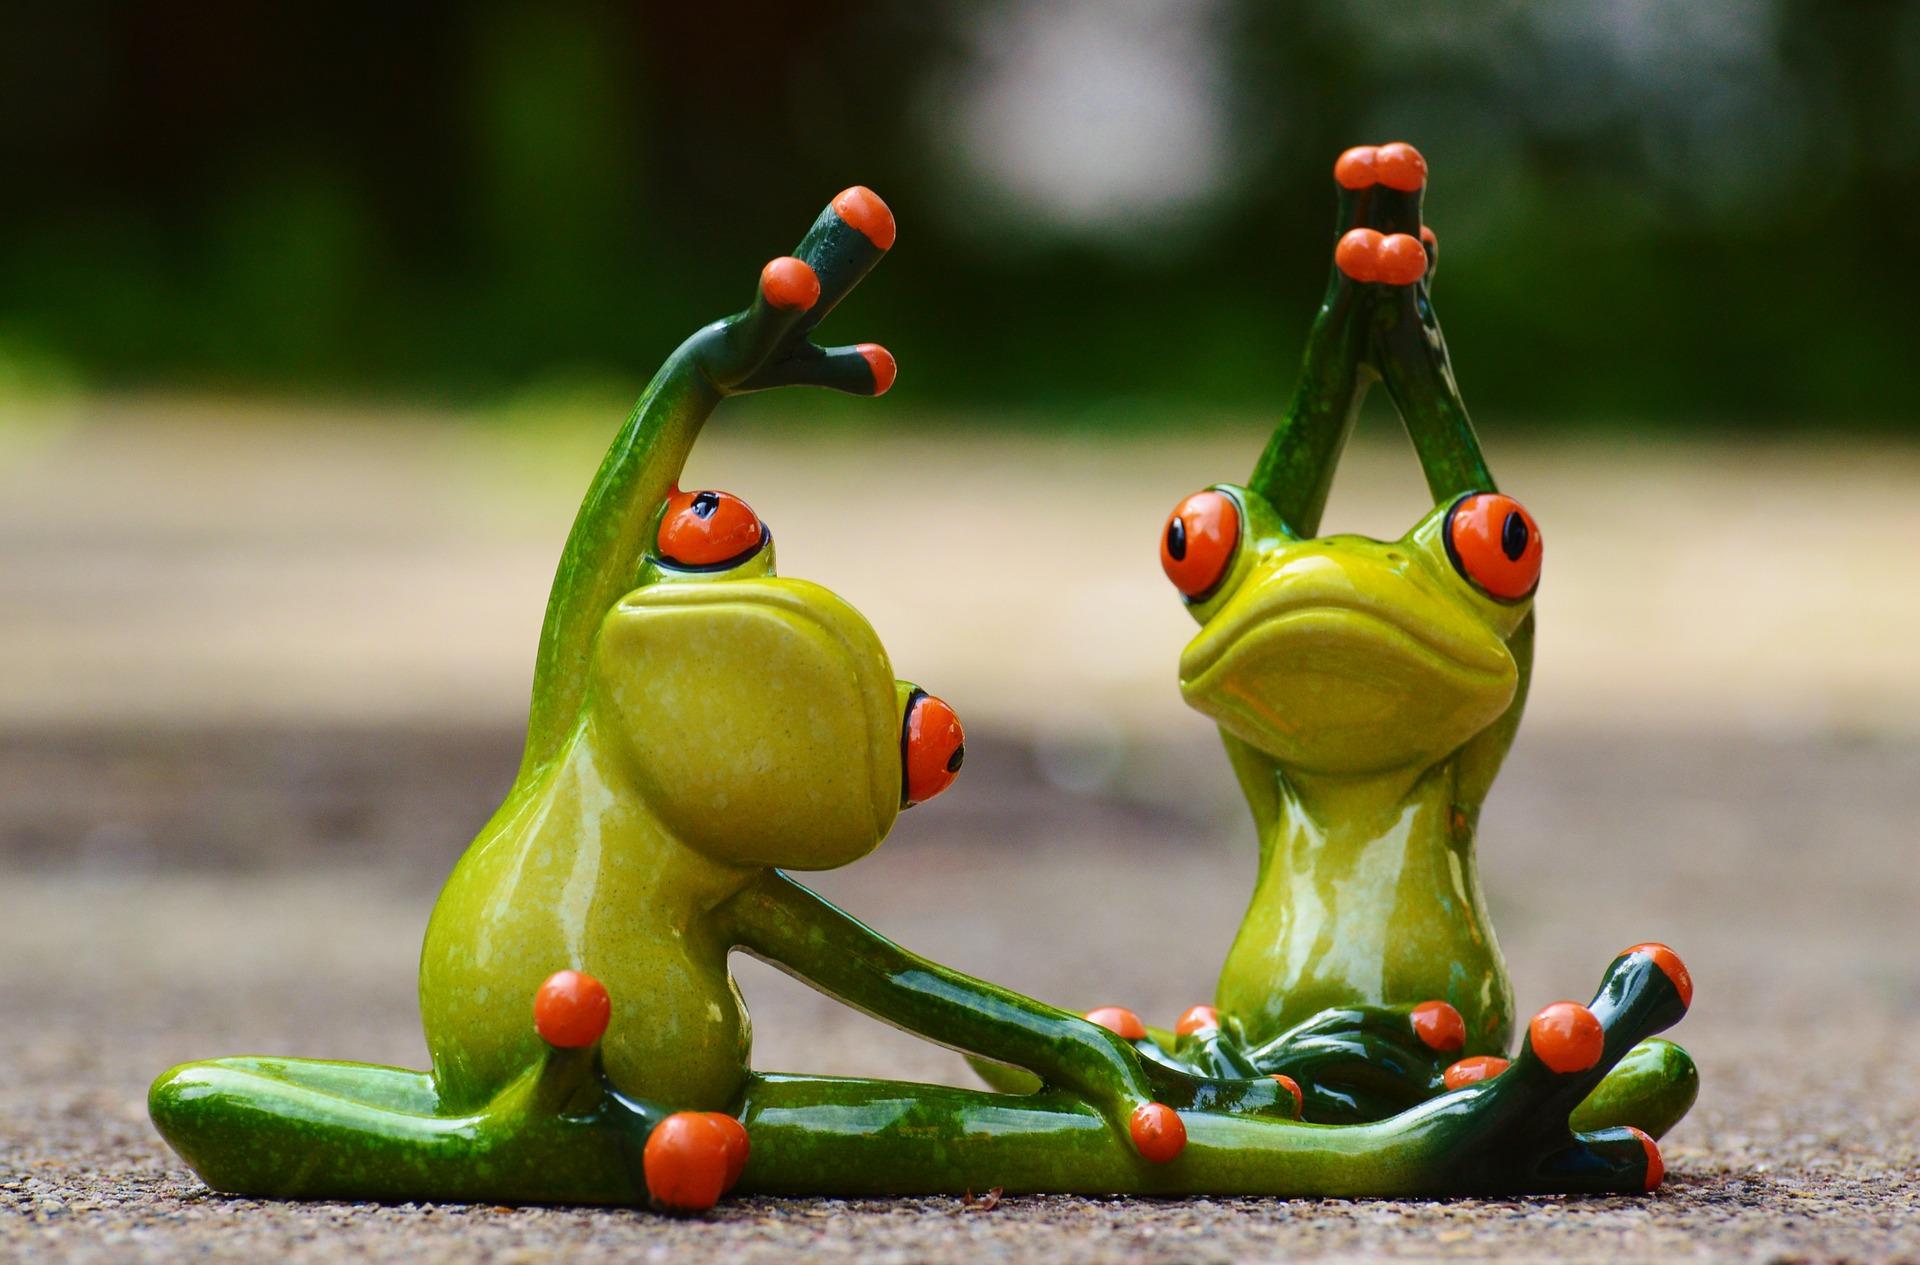 Frøer dyrker yoga